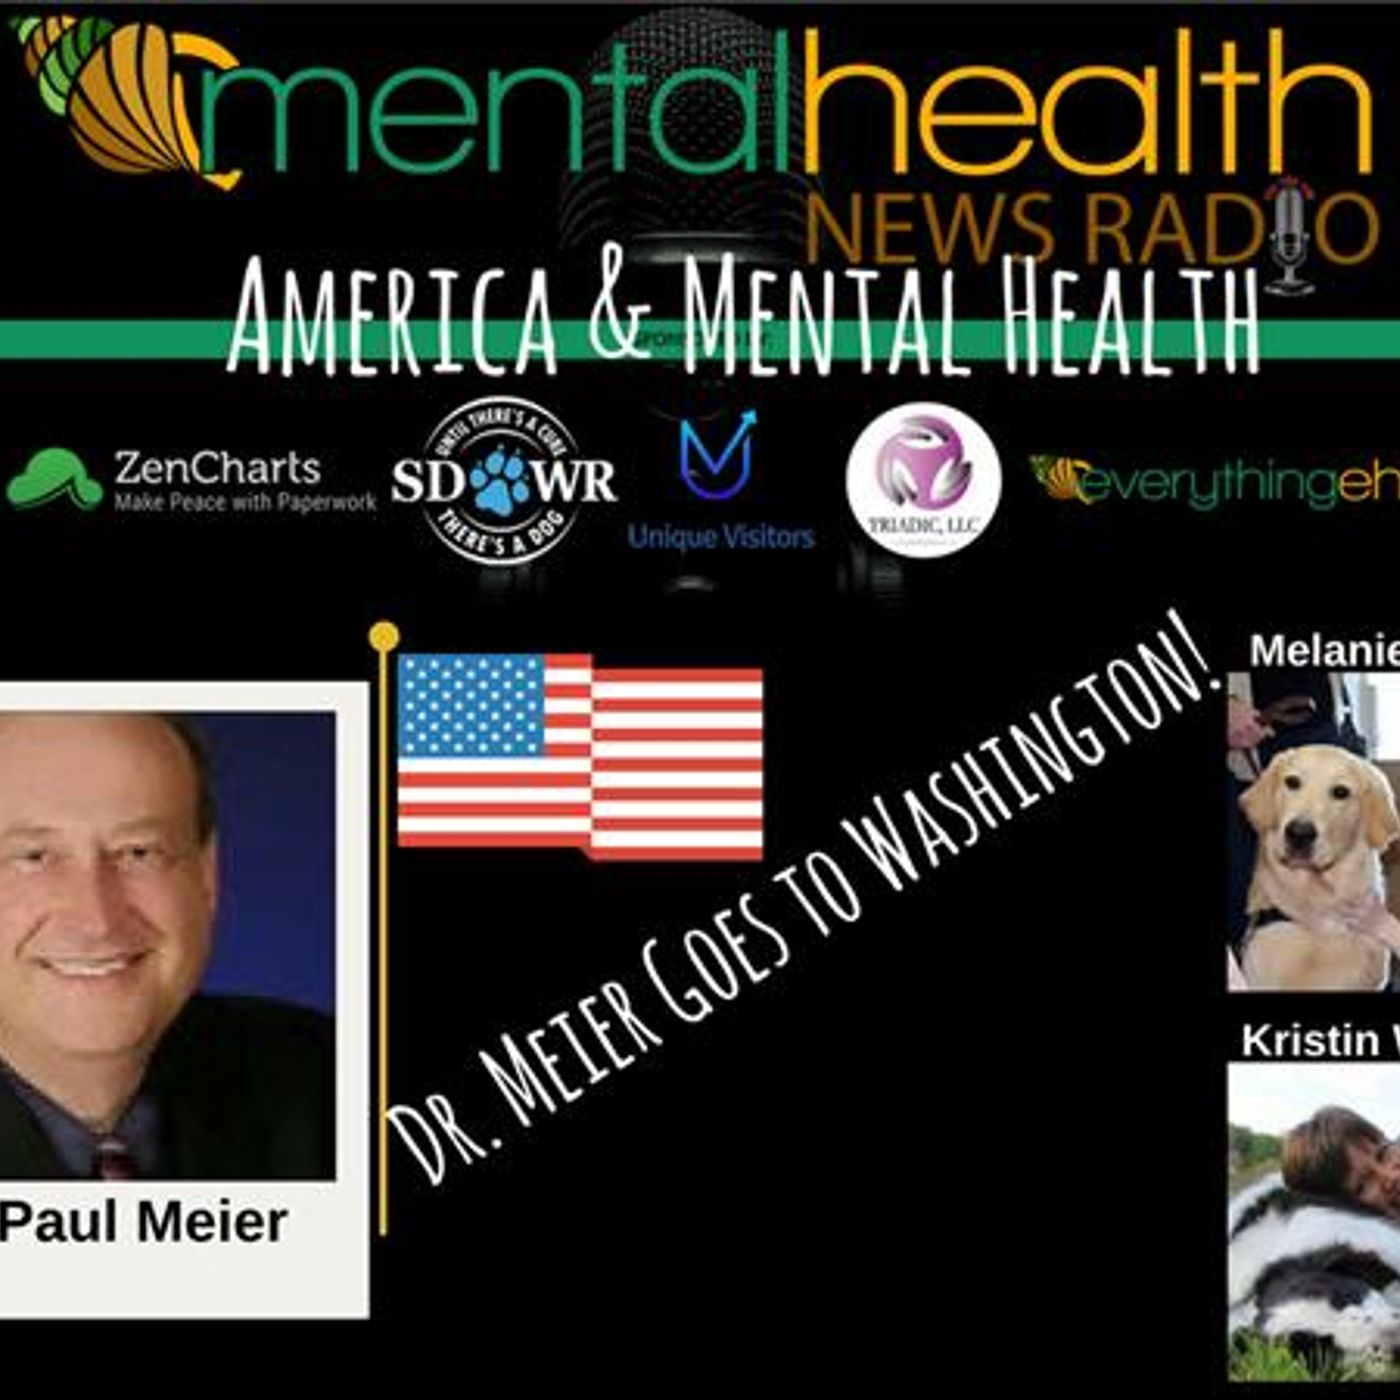 Mental Health News Radio - America & Mental Health: Dr. Paul Meier Goes To Washington